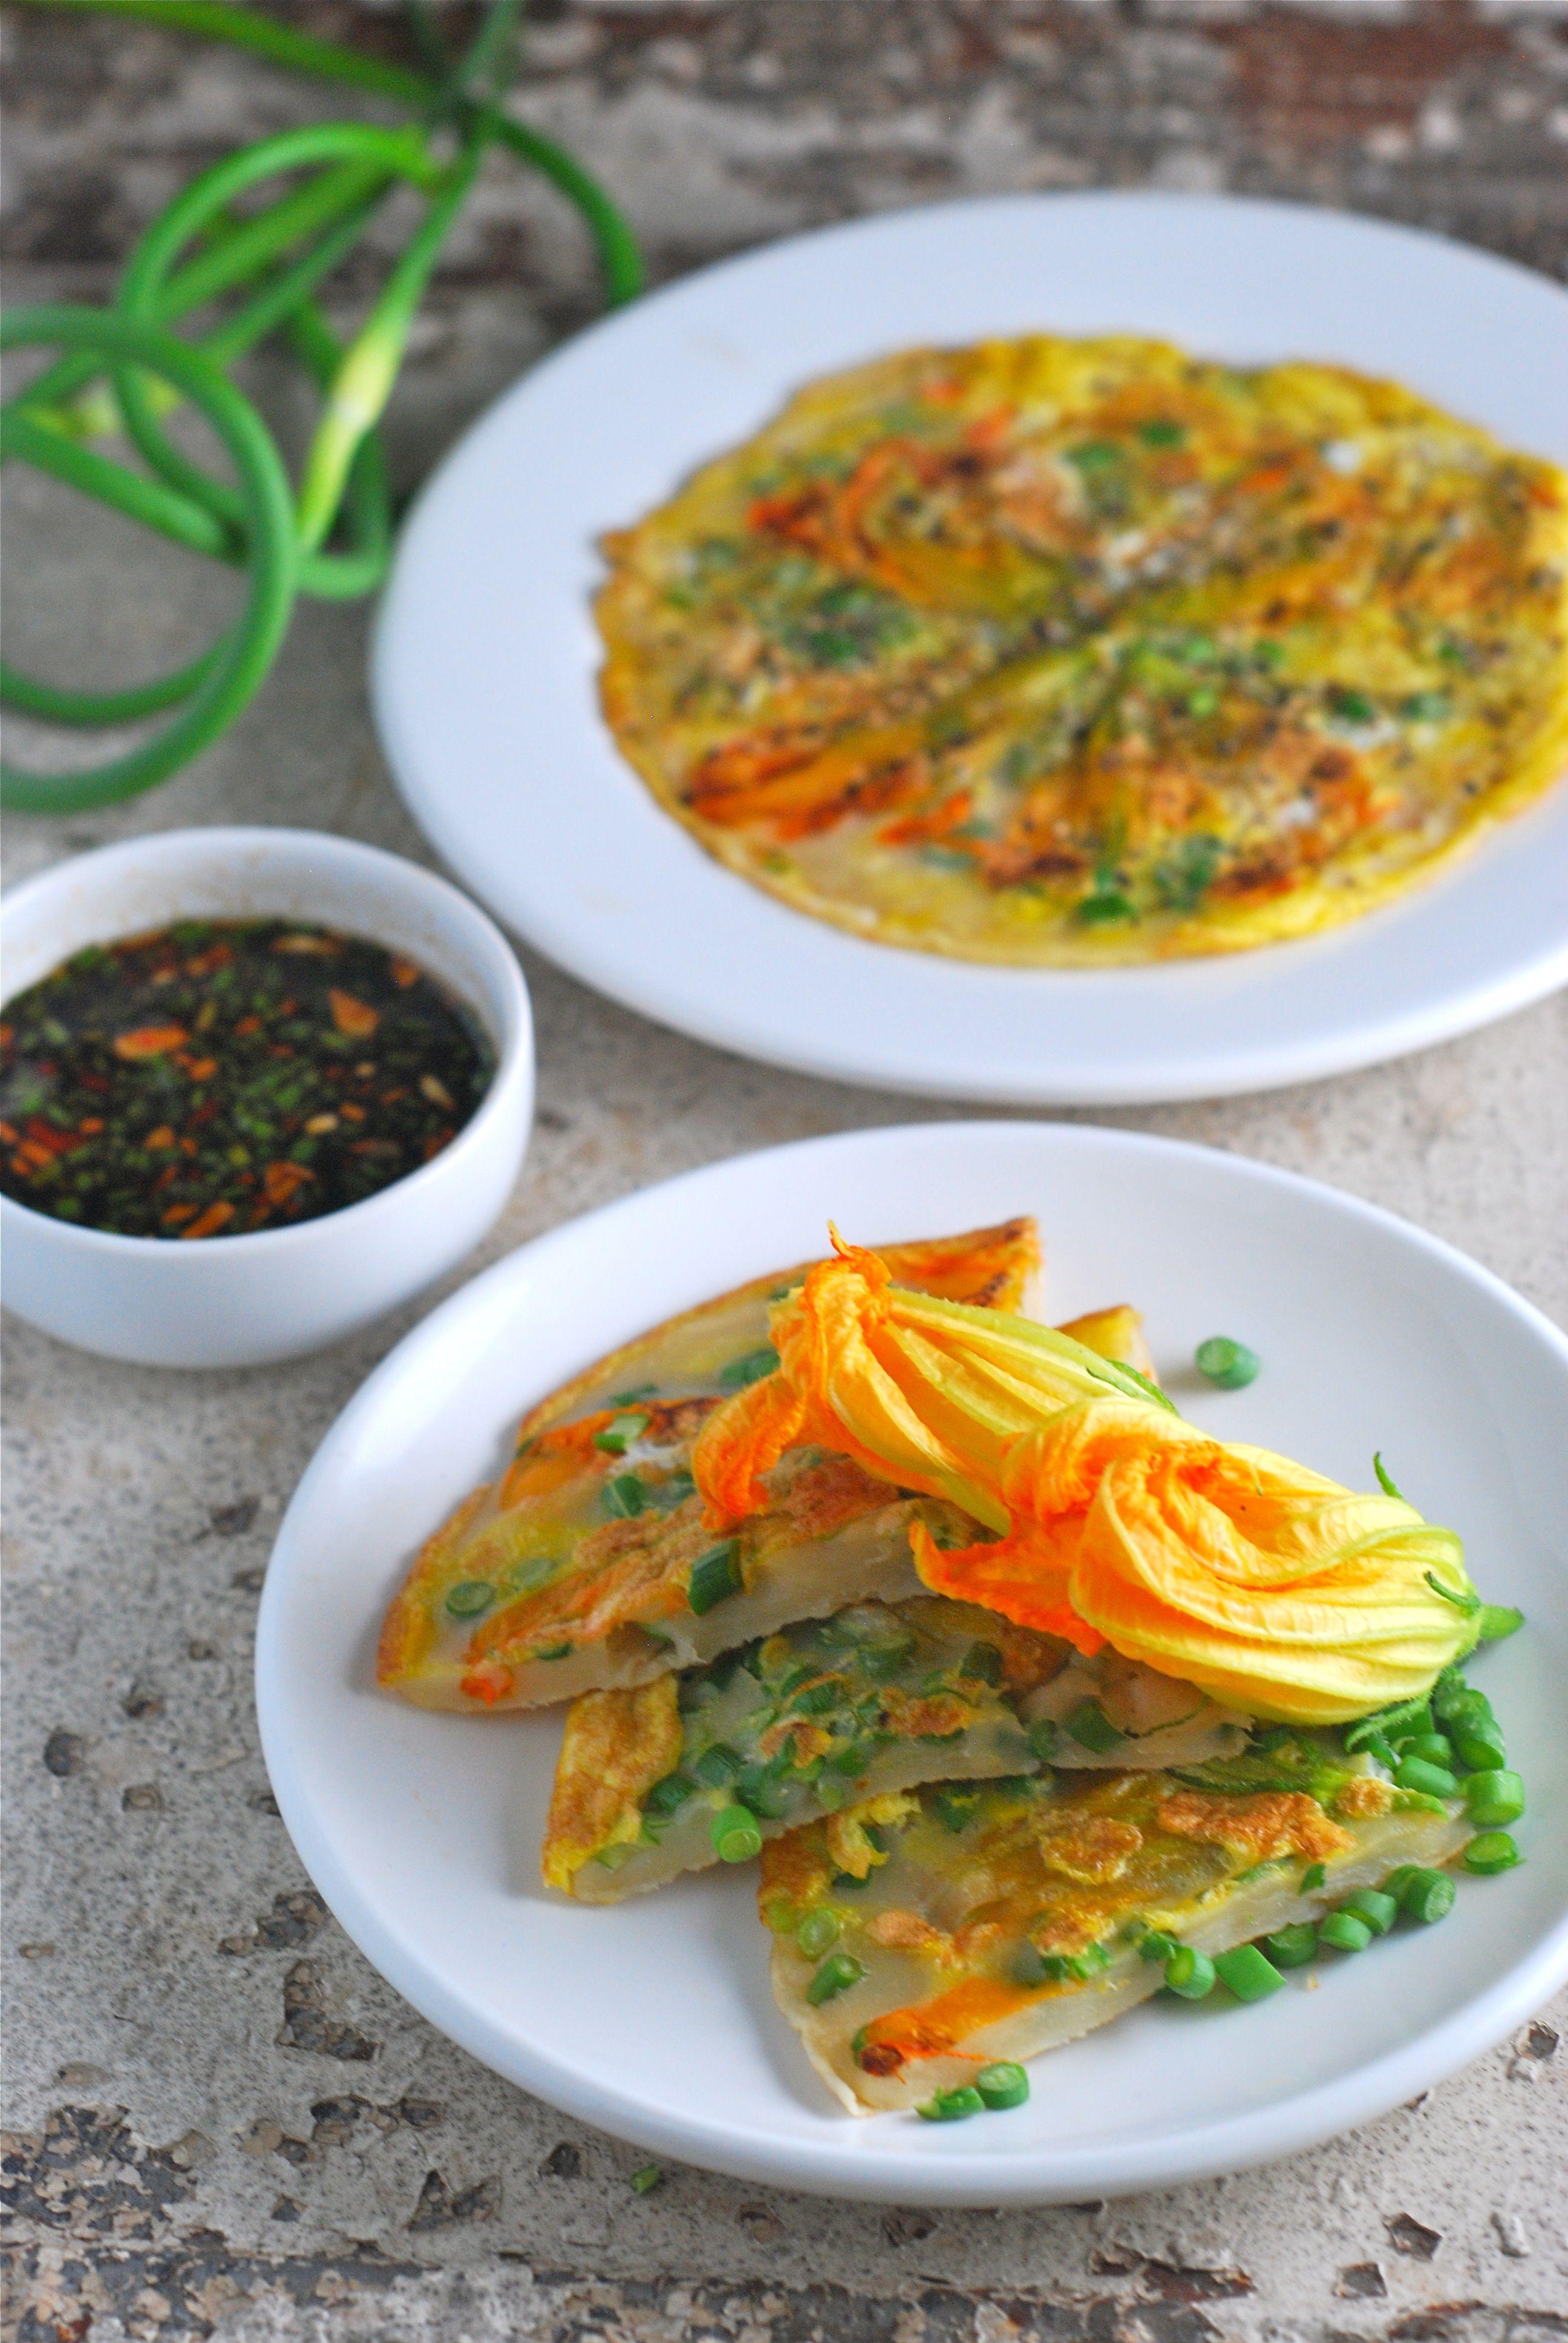 Korean pancakes with squash blossoms and garlic scapes korean pancakes with squash blossoms and garlic scapes threebeansonastring vegan vegetarian korean food recipesveggie forumfinder Image collections